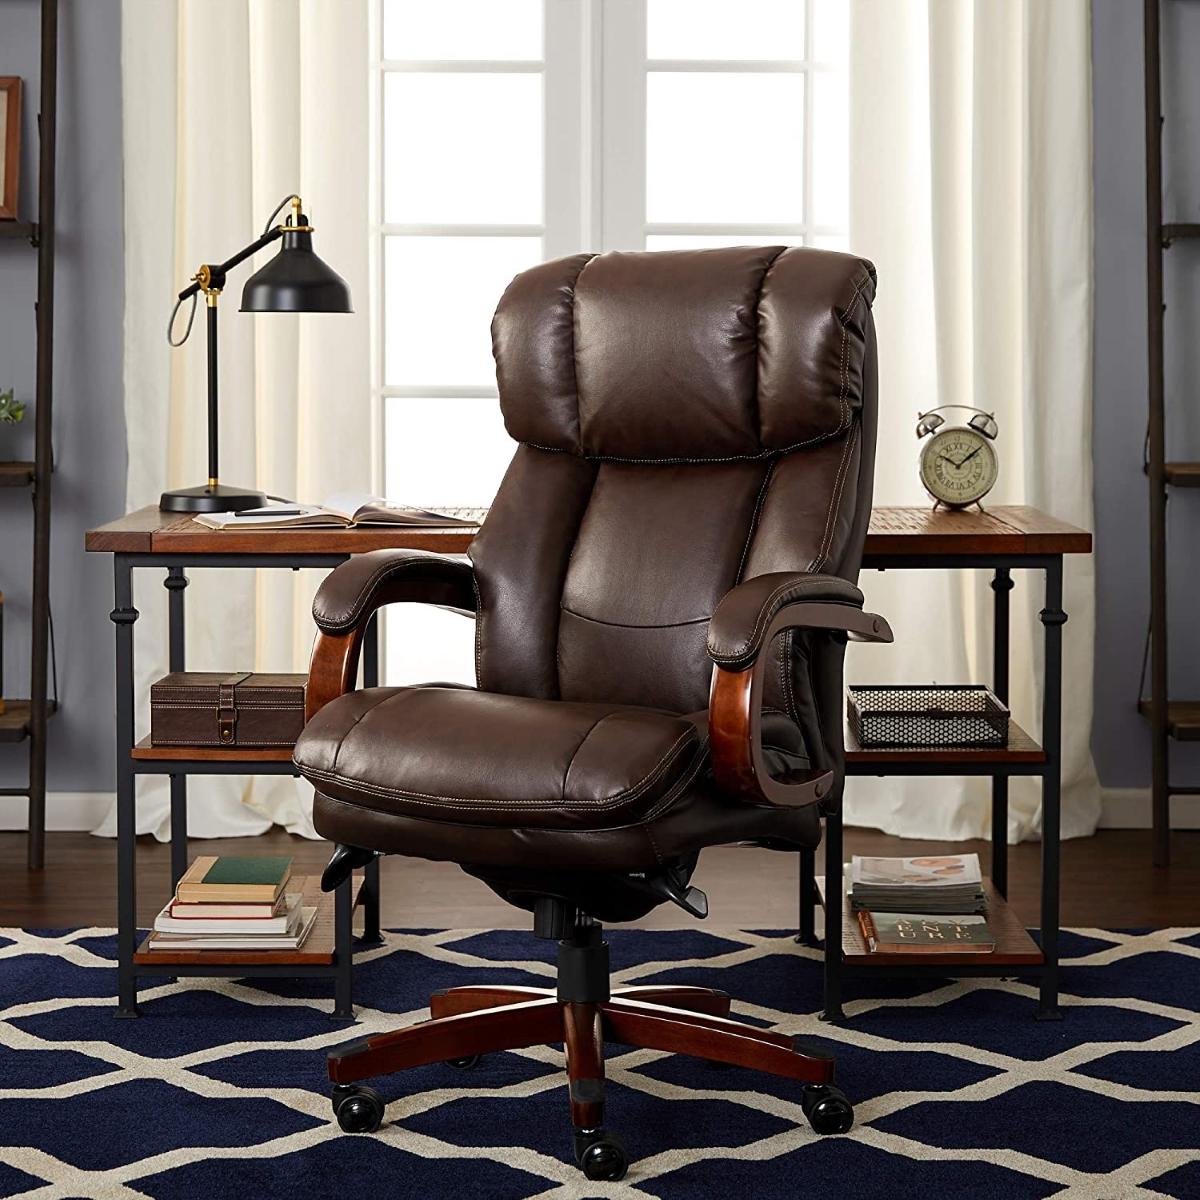 La-Z-Boy-Fairmont-Big-Tall-Executive-Leather-Office-Chair